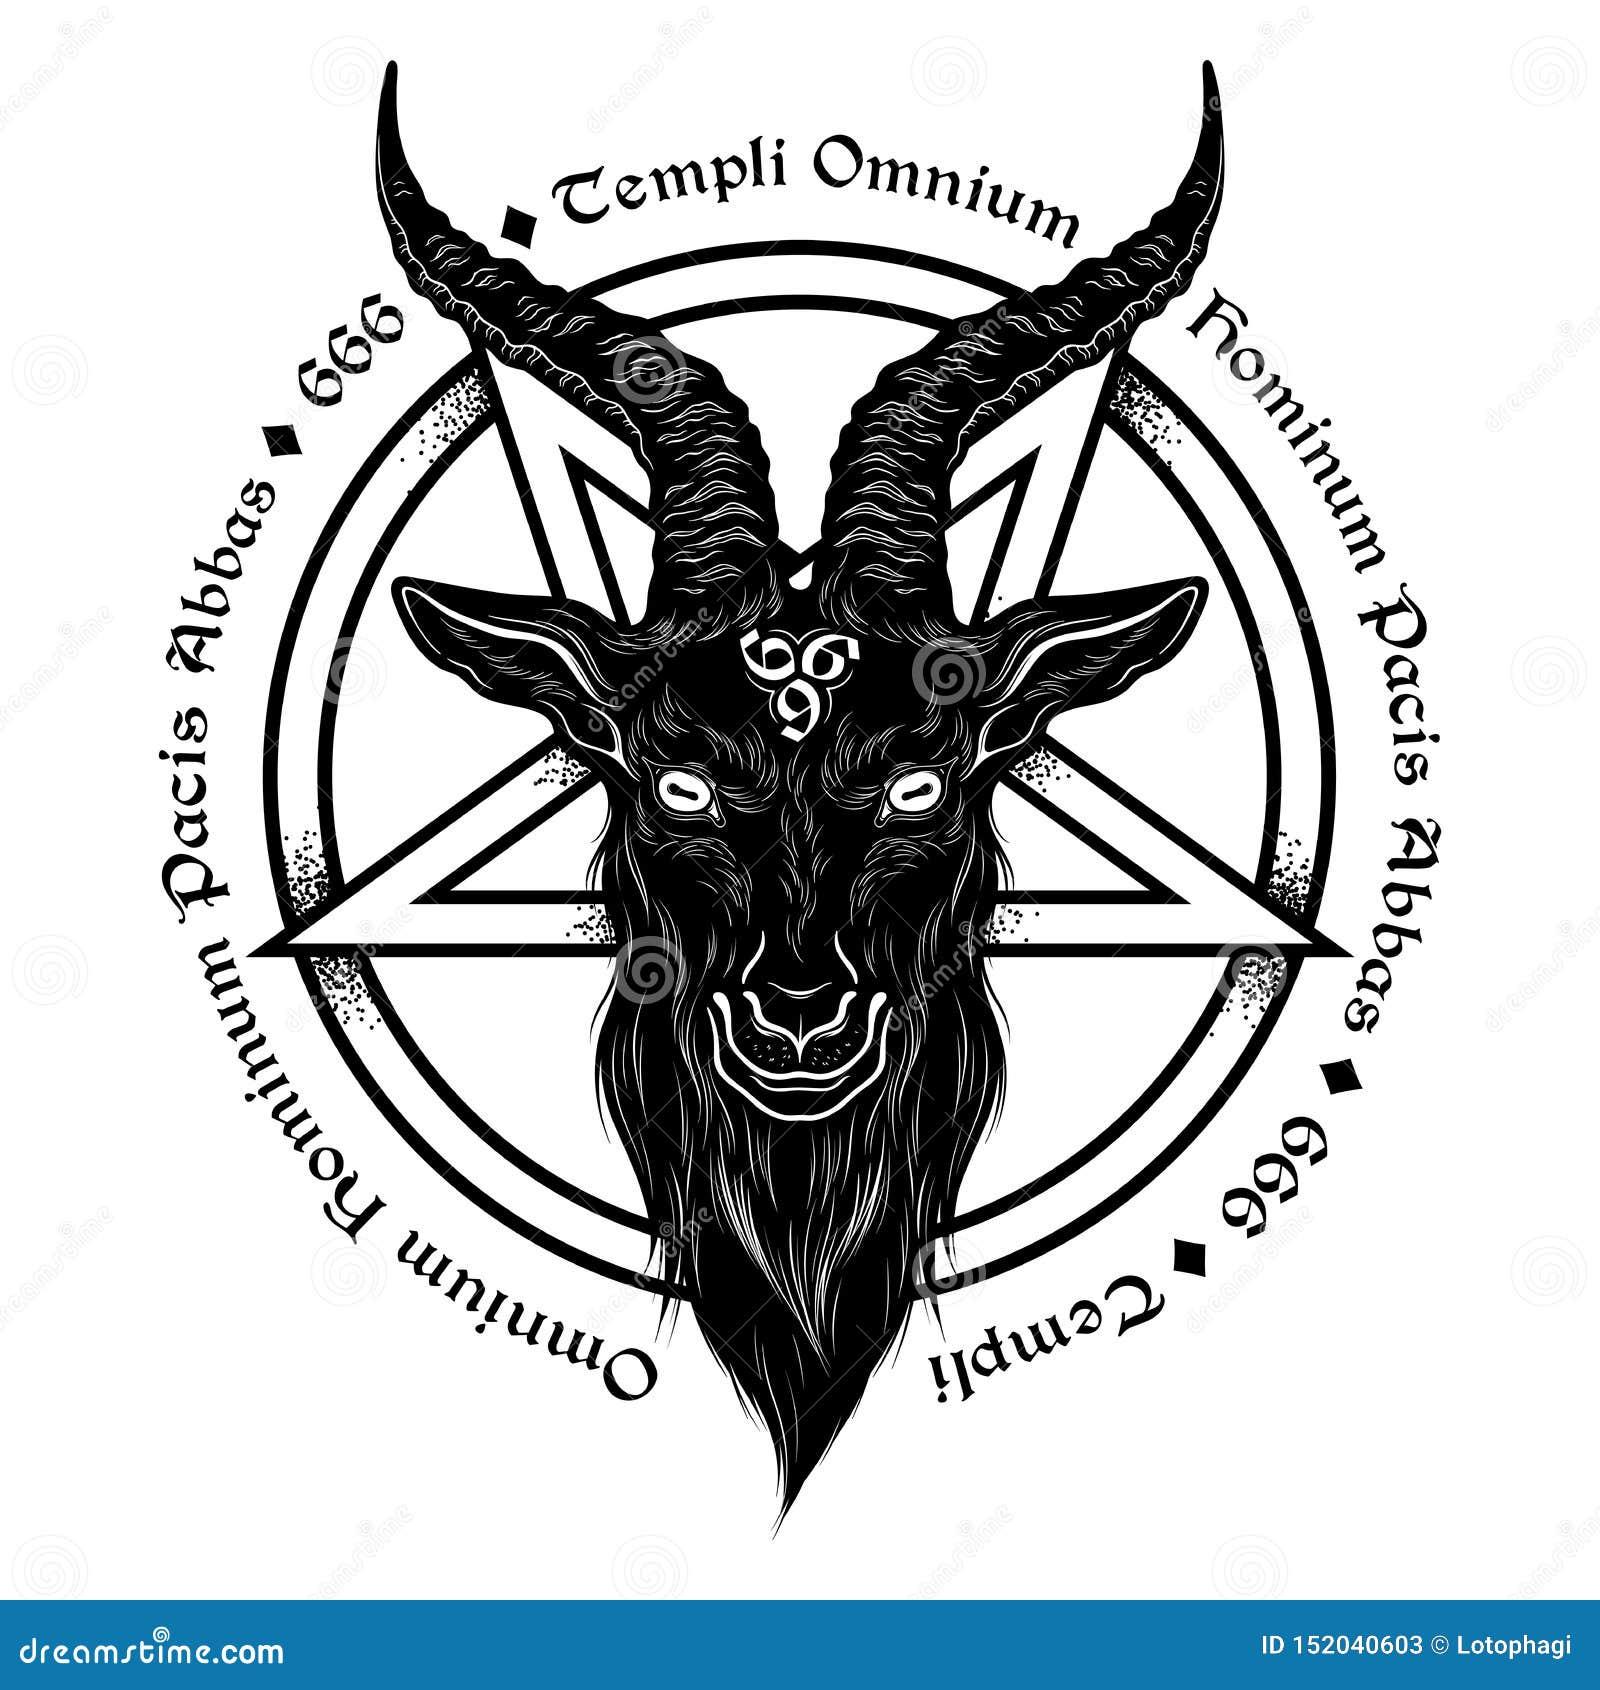 Baphomet Demon Goat Head Hand Drawn Print Or Blackwork Flash Tattoo Art Design Vector Illustration Latin Inscription Translation Stock Vector Illustration Of Esoteric Metal 152040603